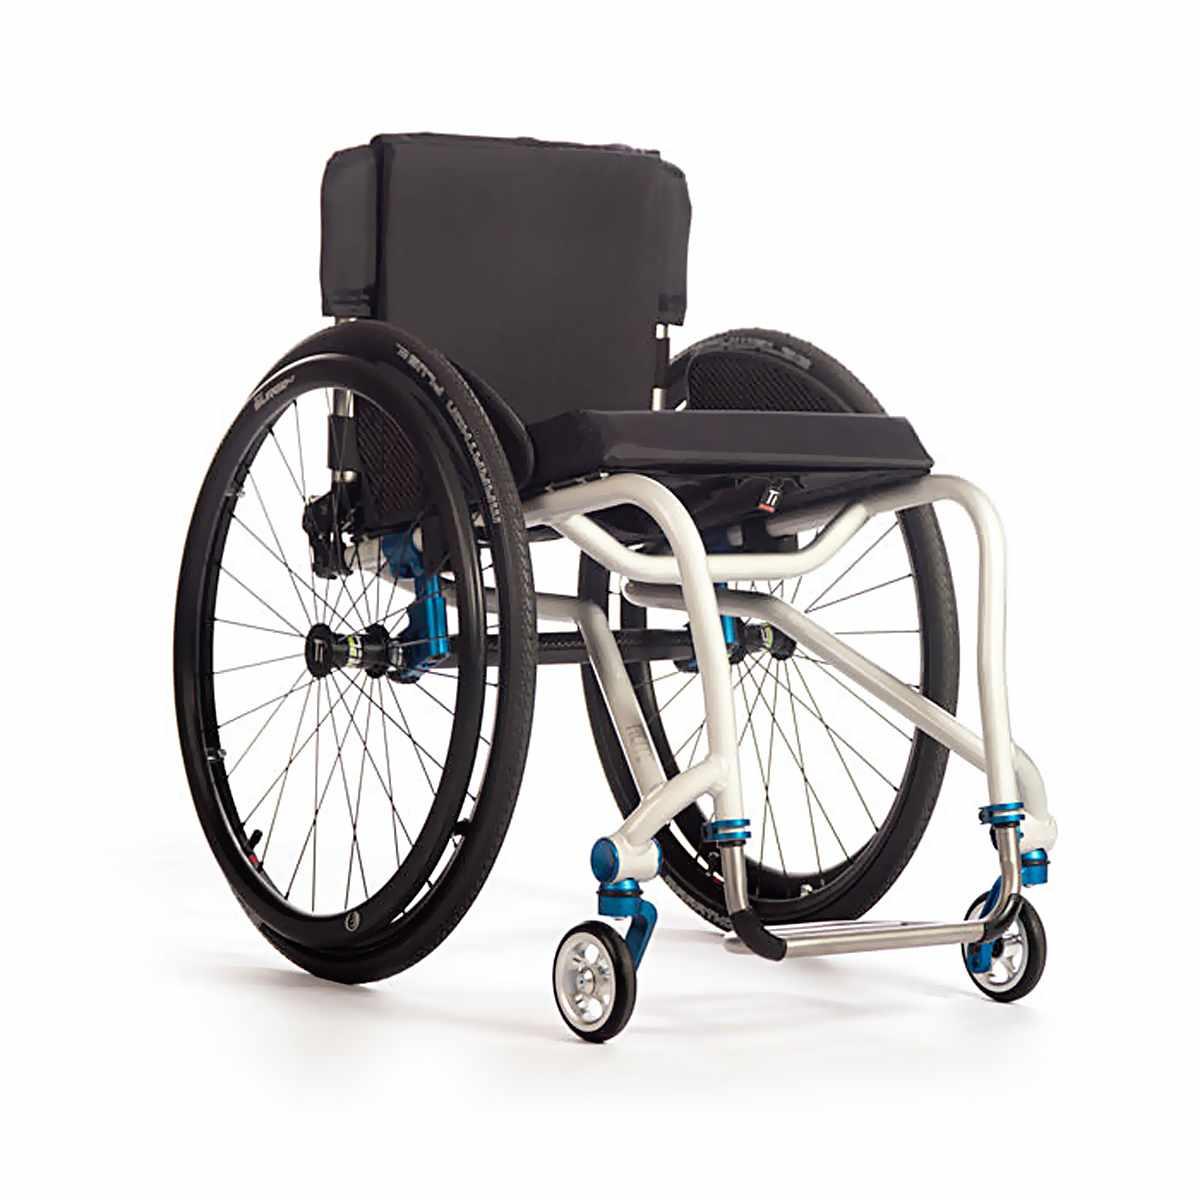 TiLite Aero T series rigid ultralight wheelchair